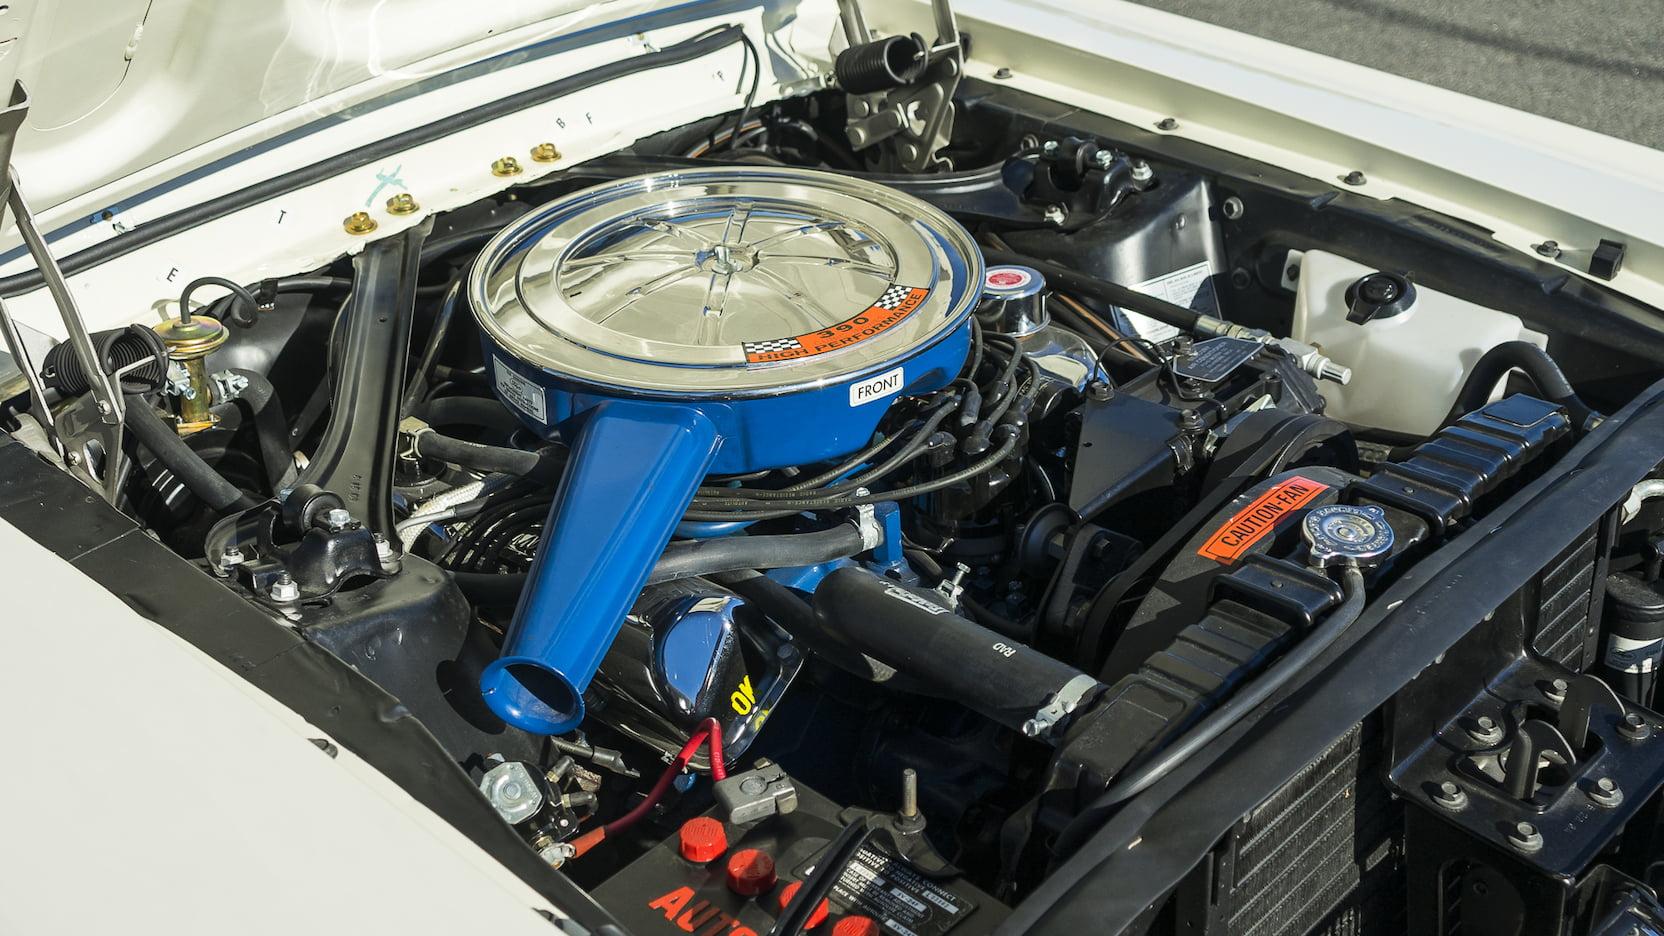 1967 Mercury Cougar engine